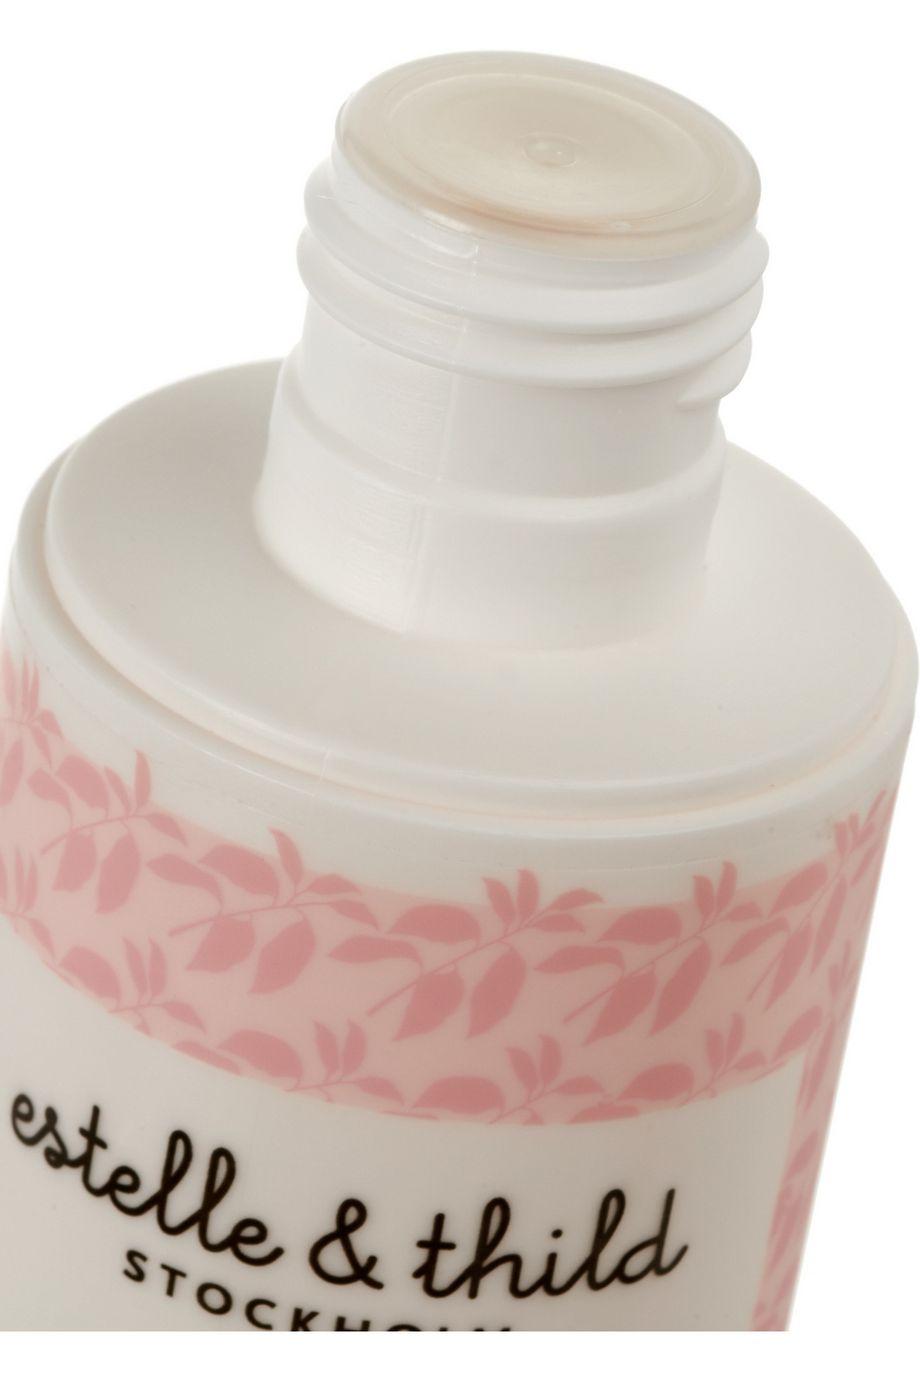 Estelle & Thild Biocare Baby Pregnancy Body Oil